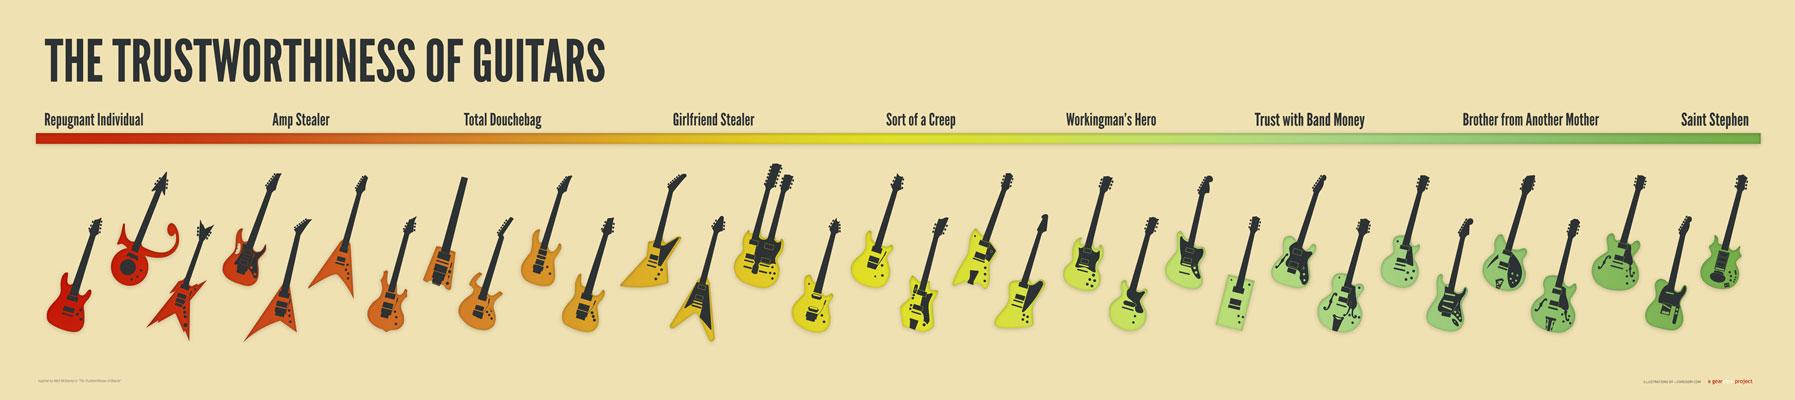 GearPipe.com | Trustworthiness of Guitars Scale